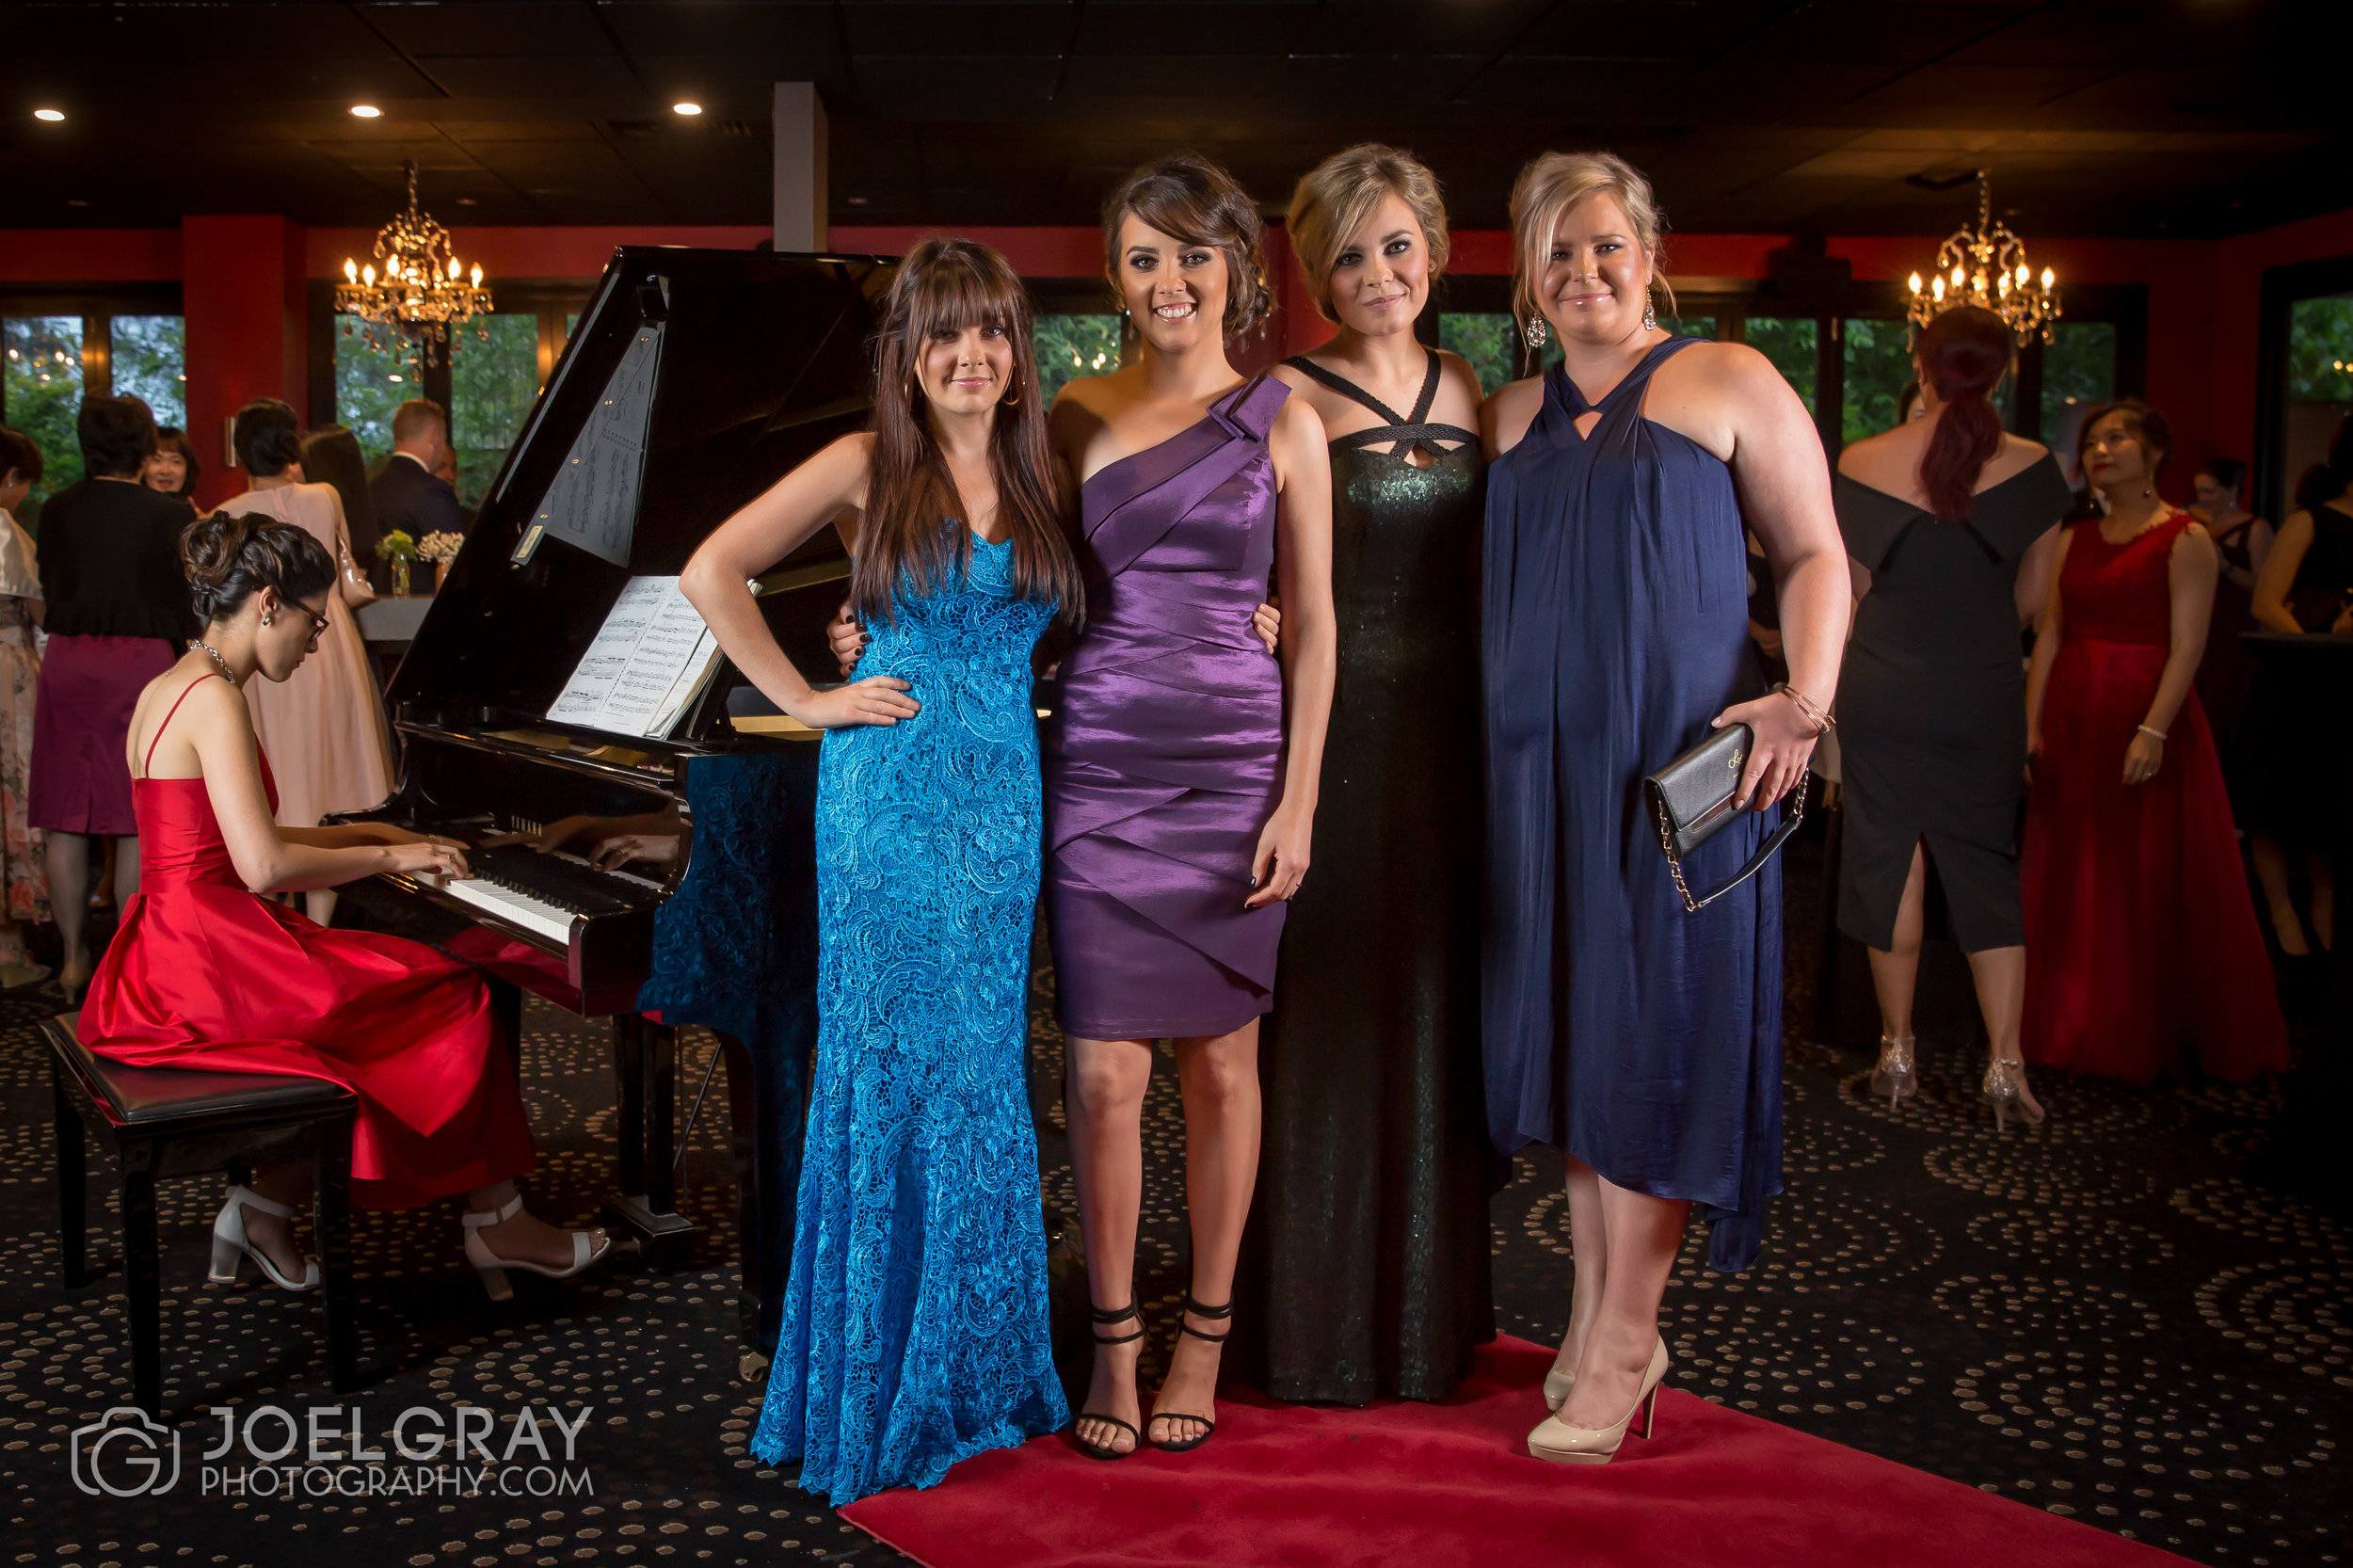 sydney-photographer-event-photography-1800829994